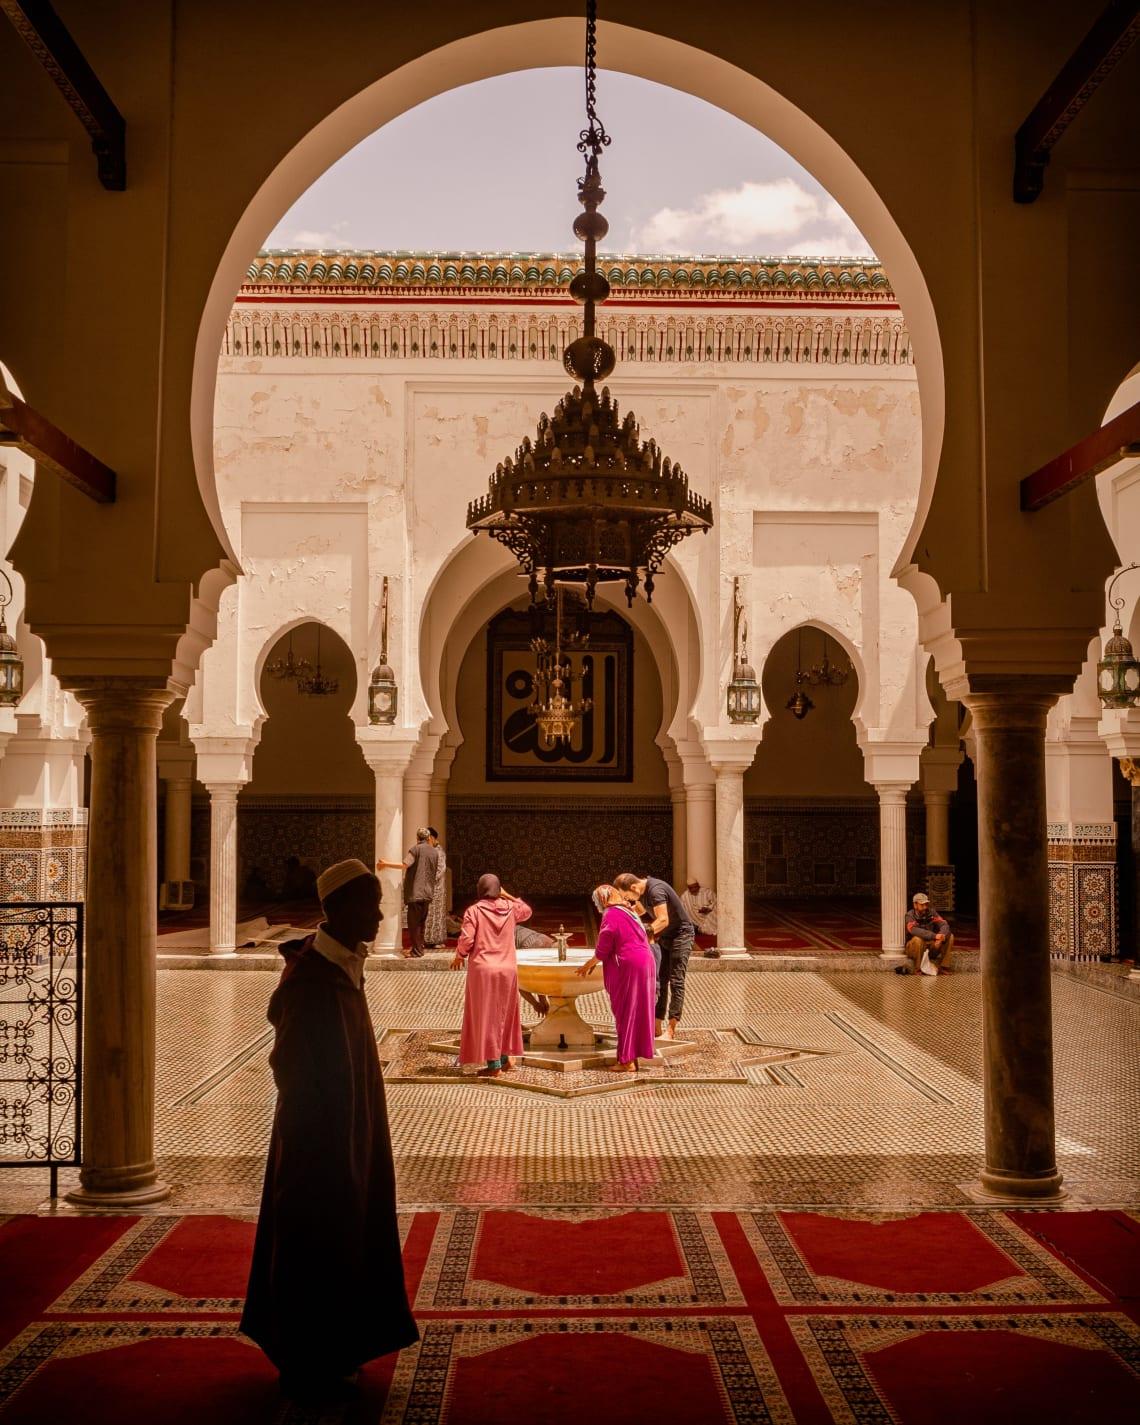 Mosque, Fez, Morocco